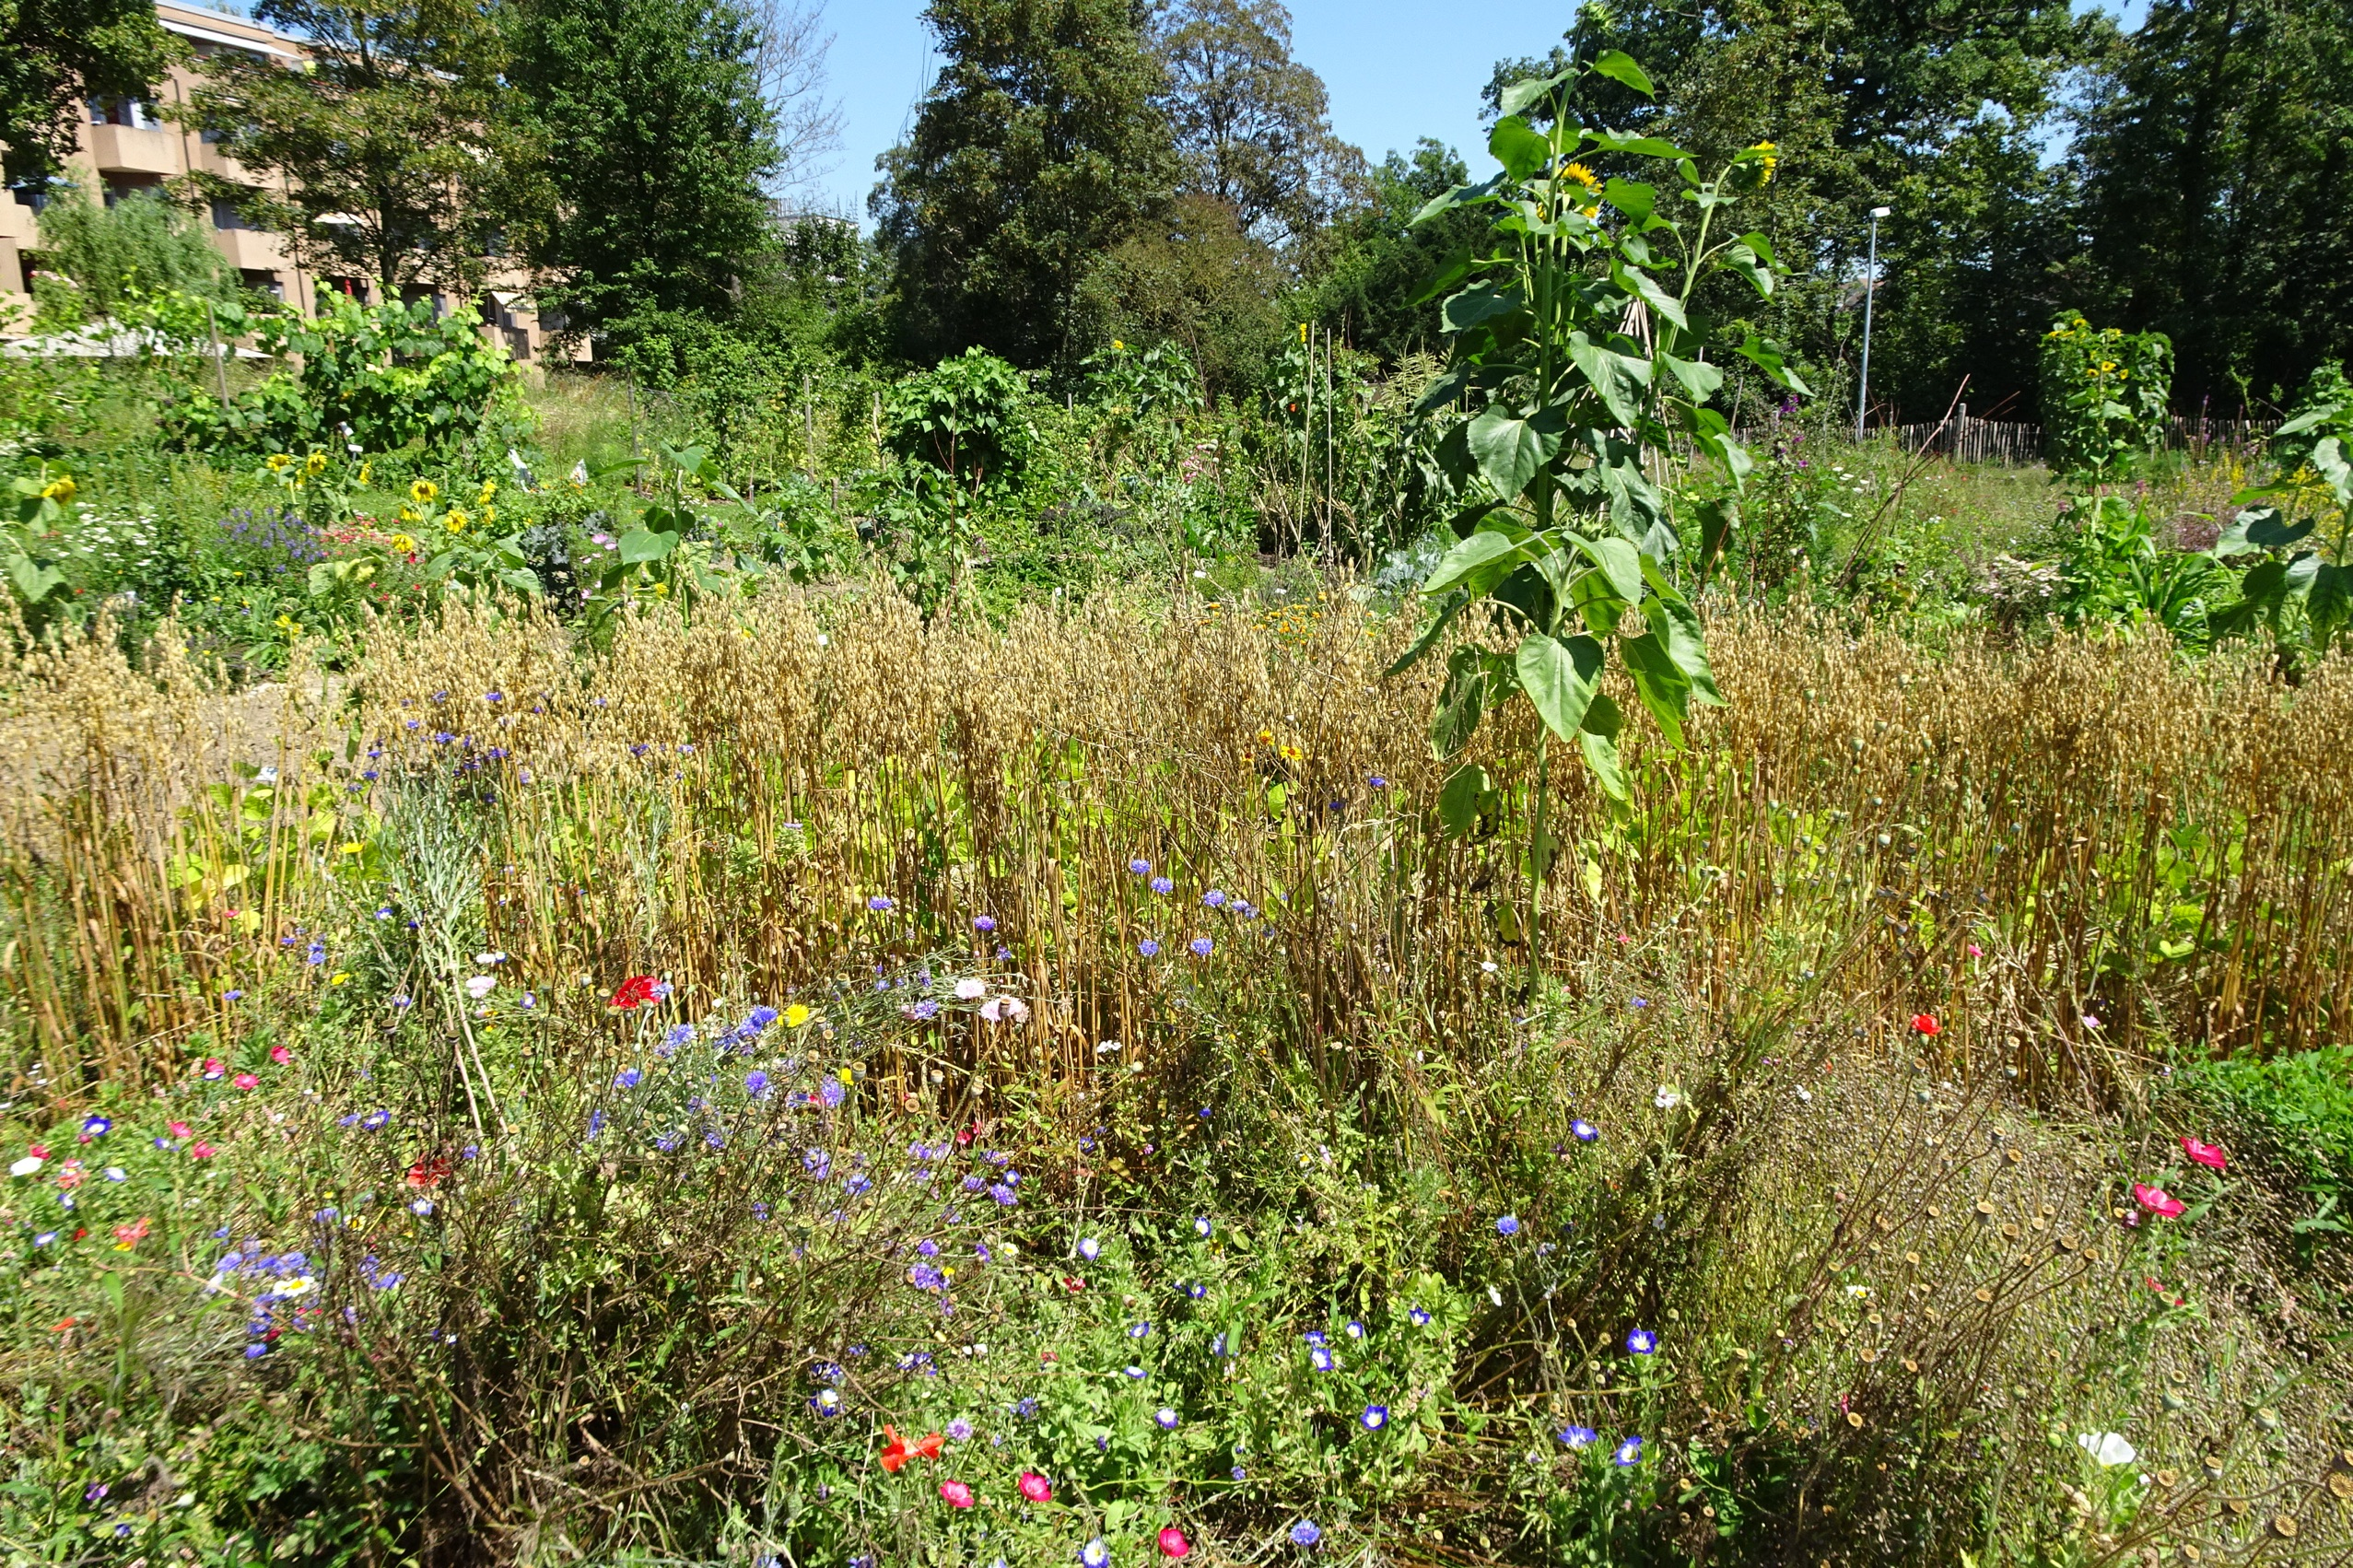 2020-08-07 Ogif Garten 01